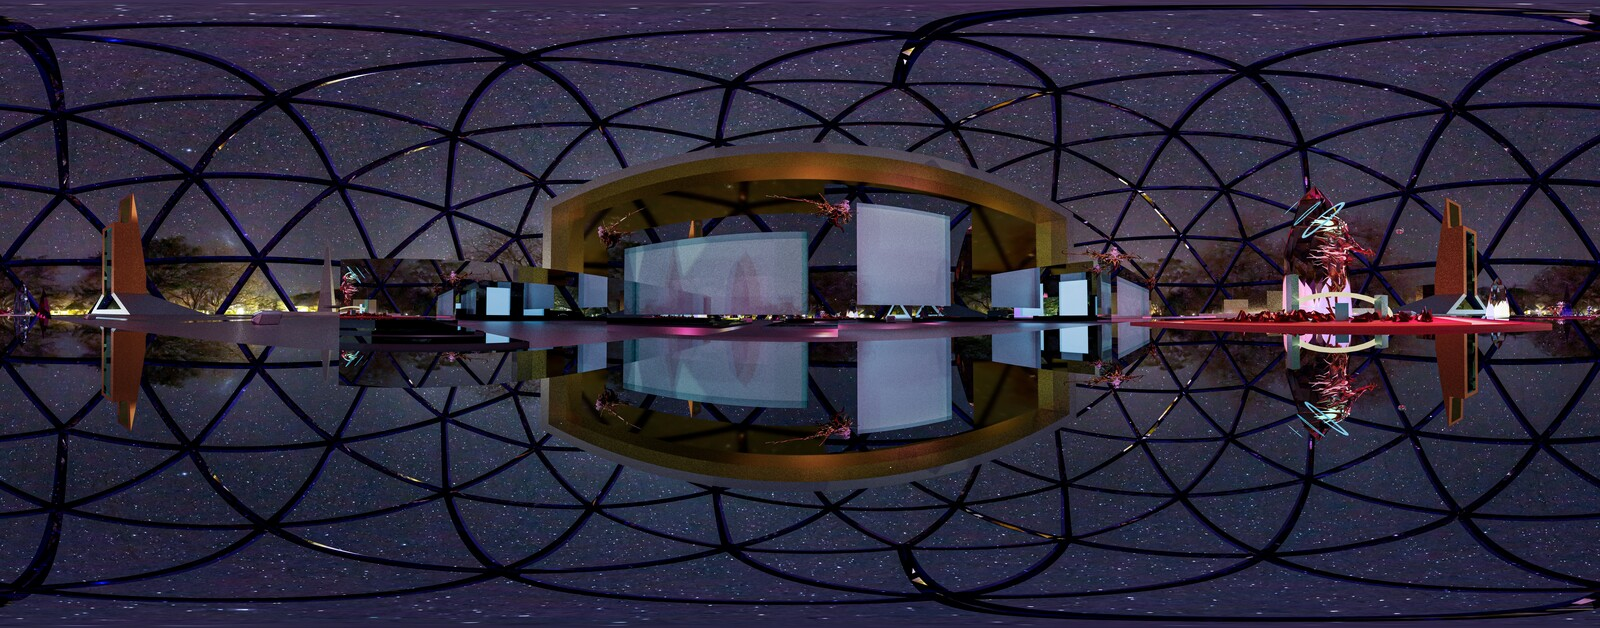 Psyfi Panorama PsyberSpace 2